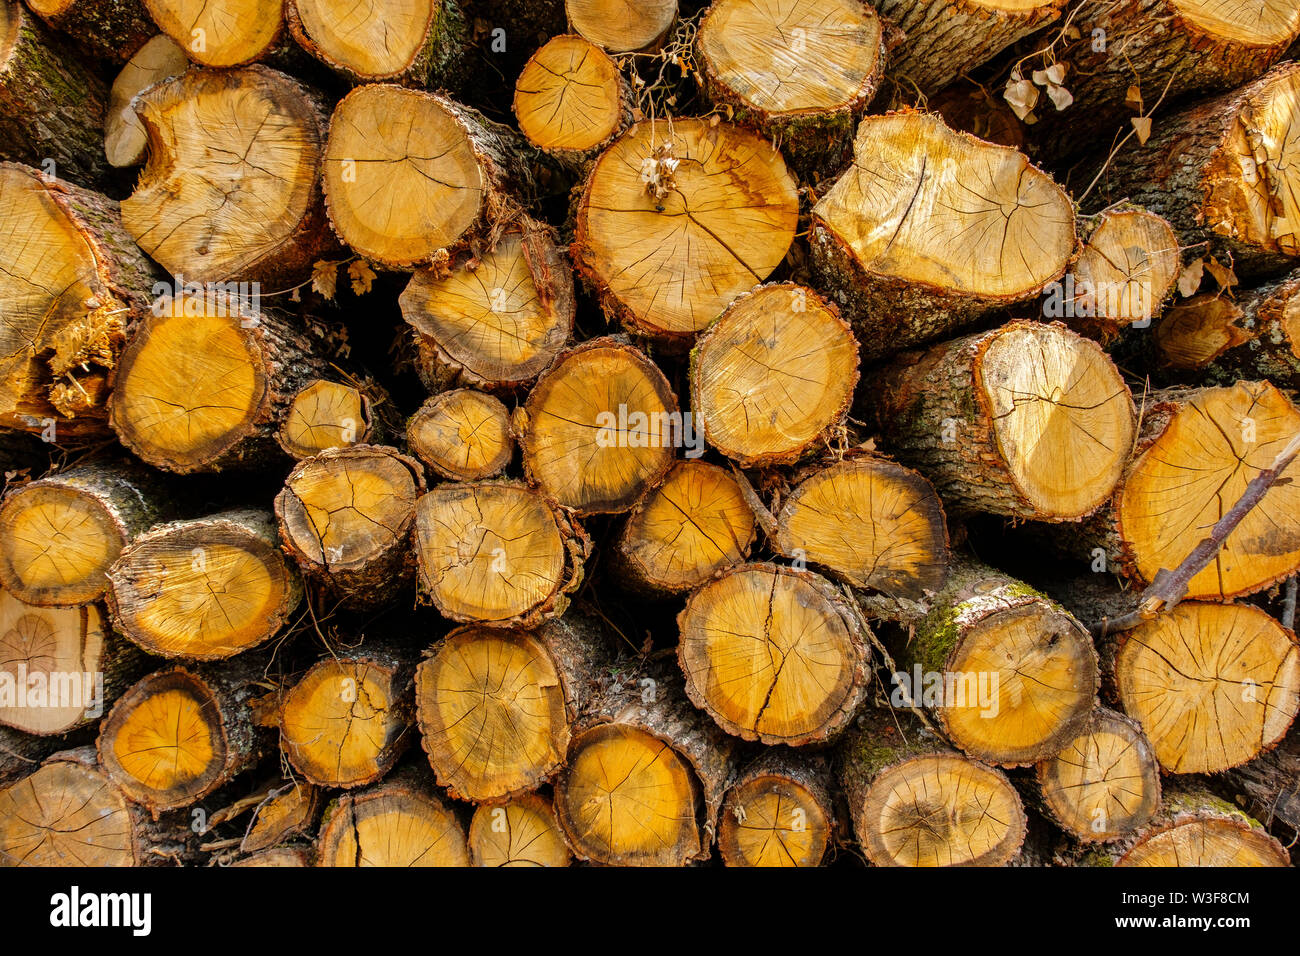 Montón de troncos de madera, Sossay Puygarreau cerca. Vienne, Poitou Charente. Francia Europa Foto de stock